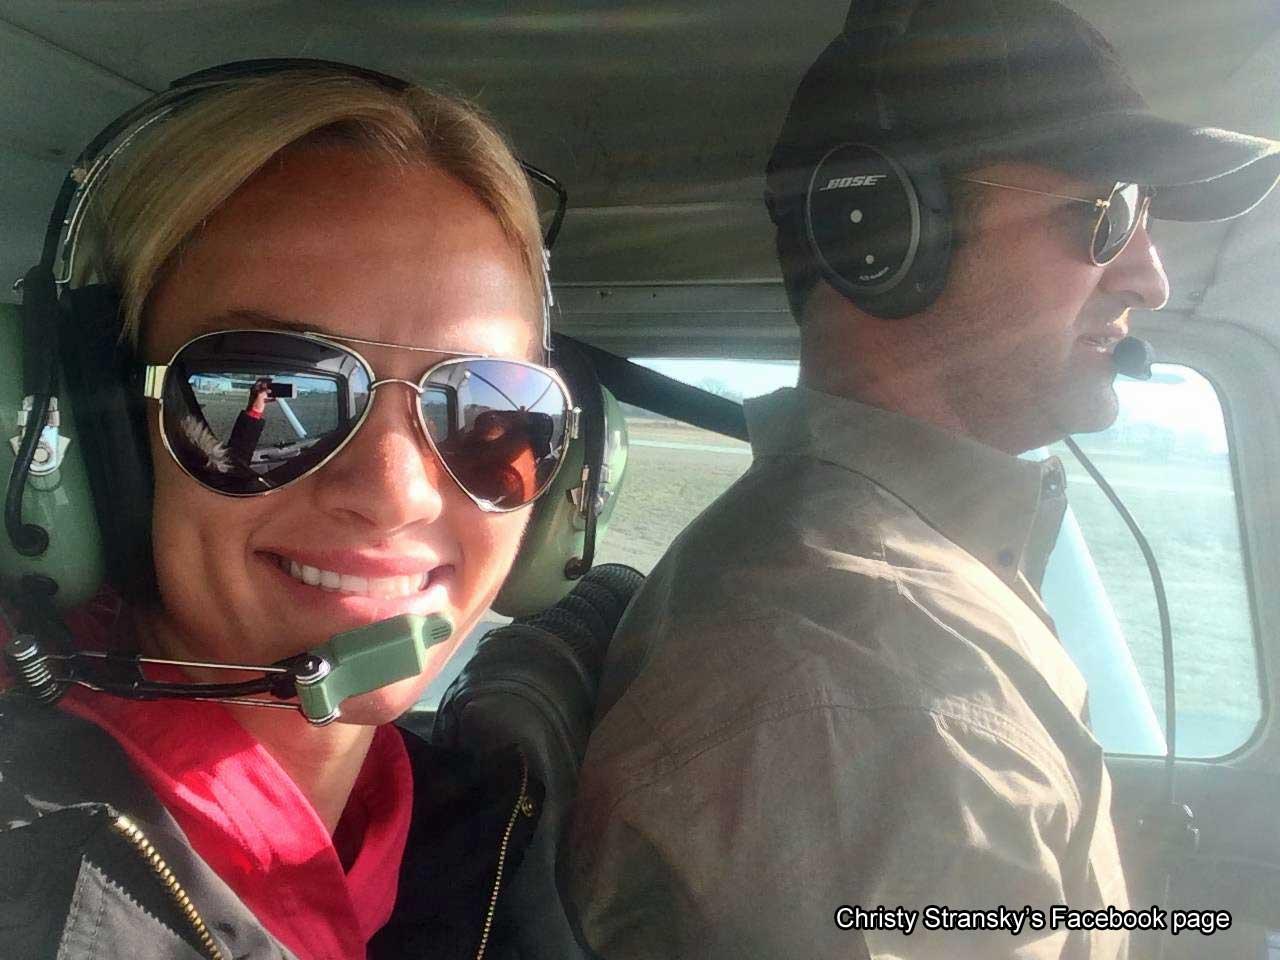 Christy Stransky and York Gill via Facebook